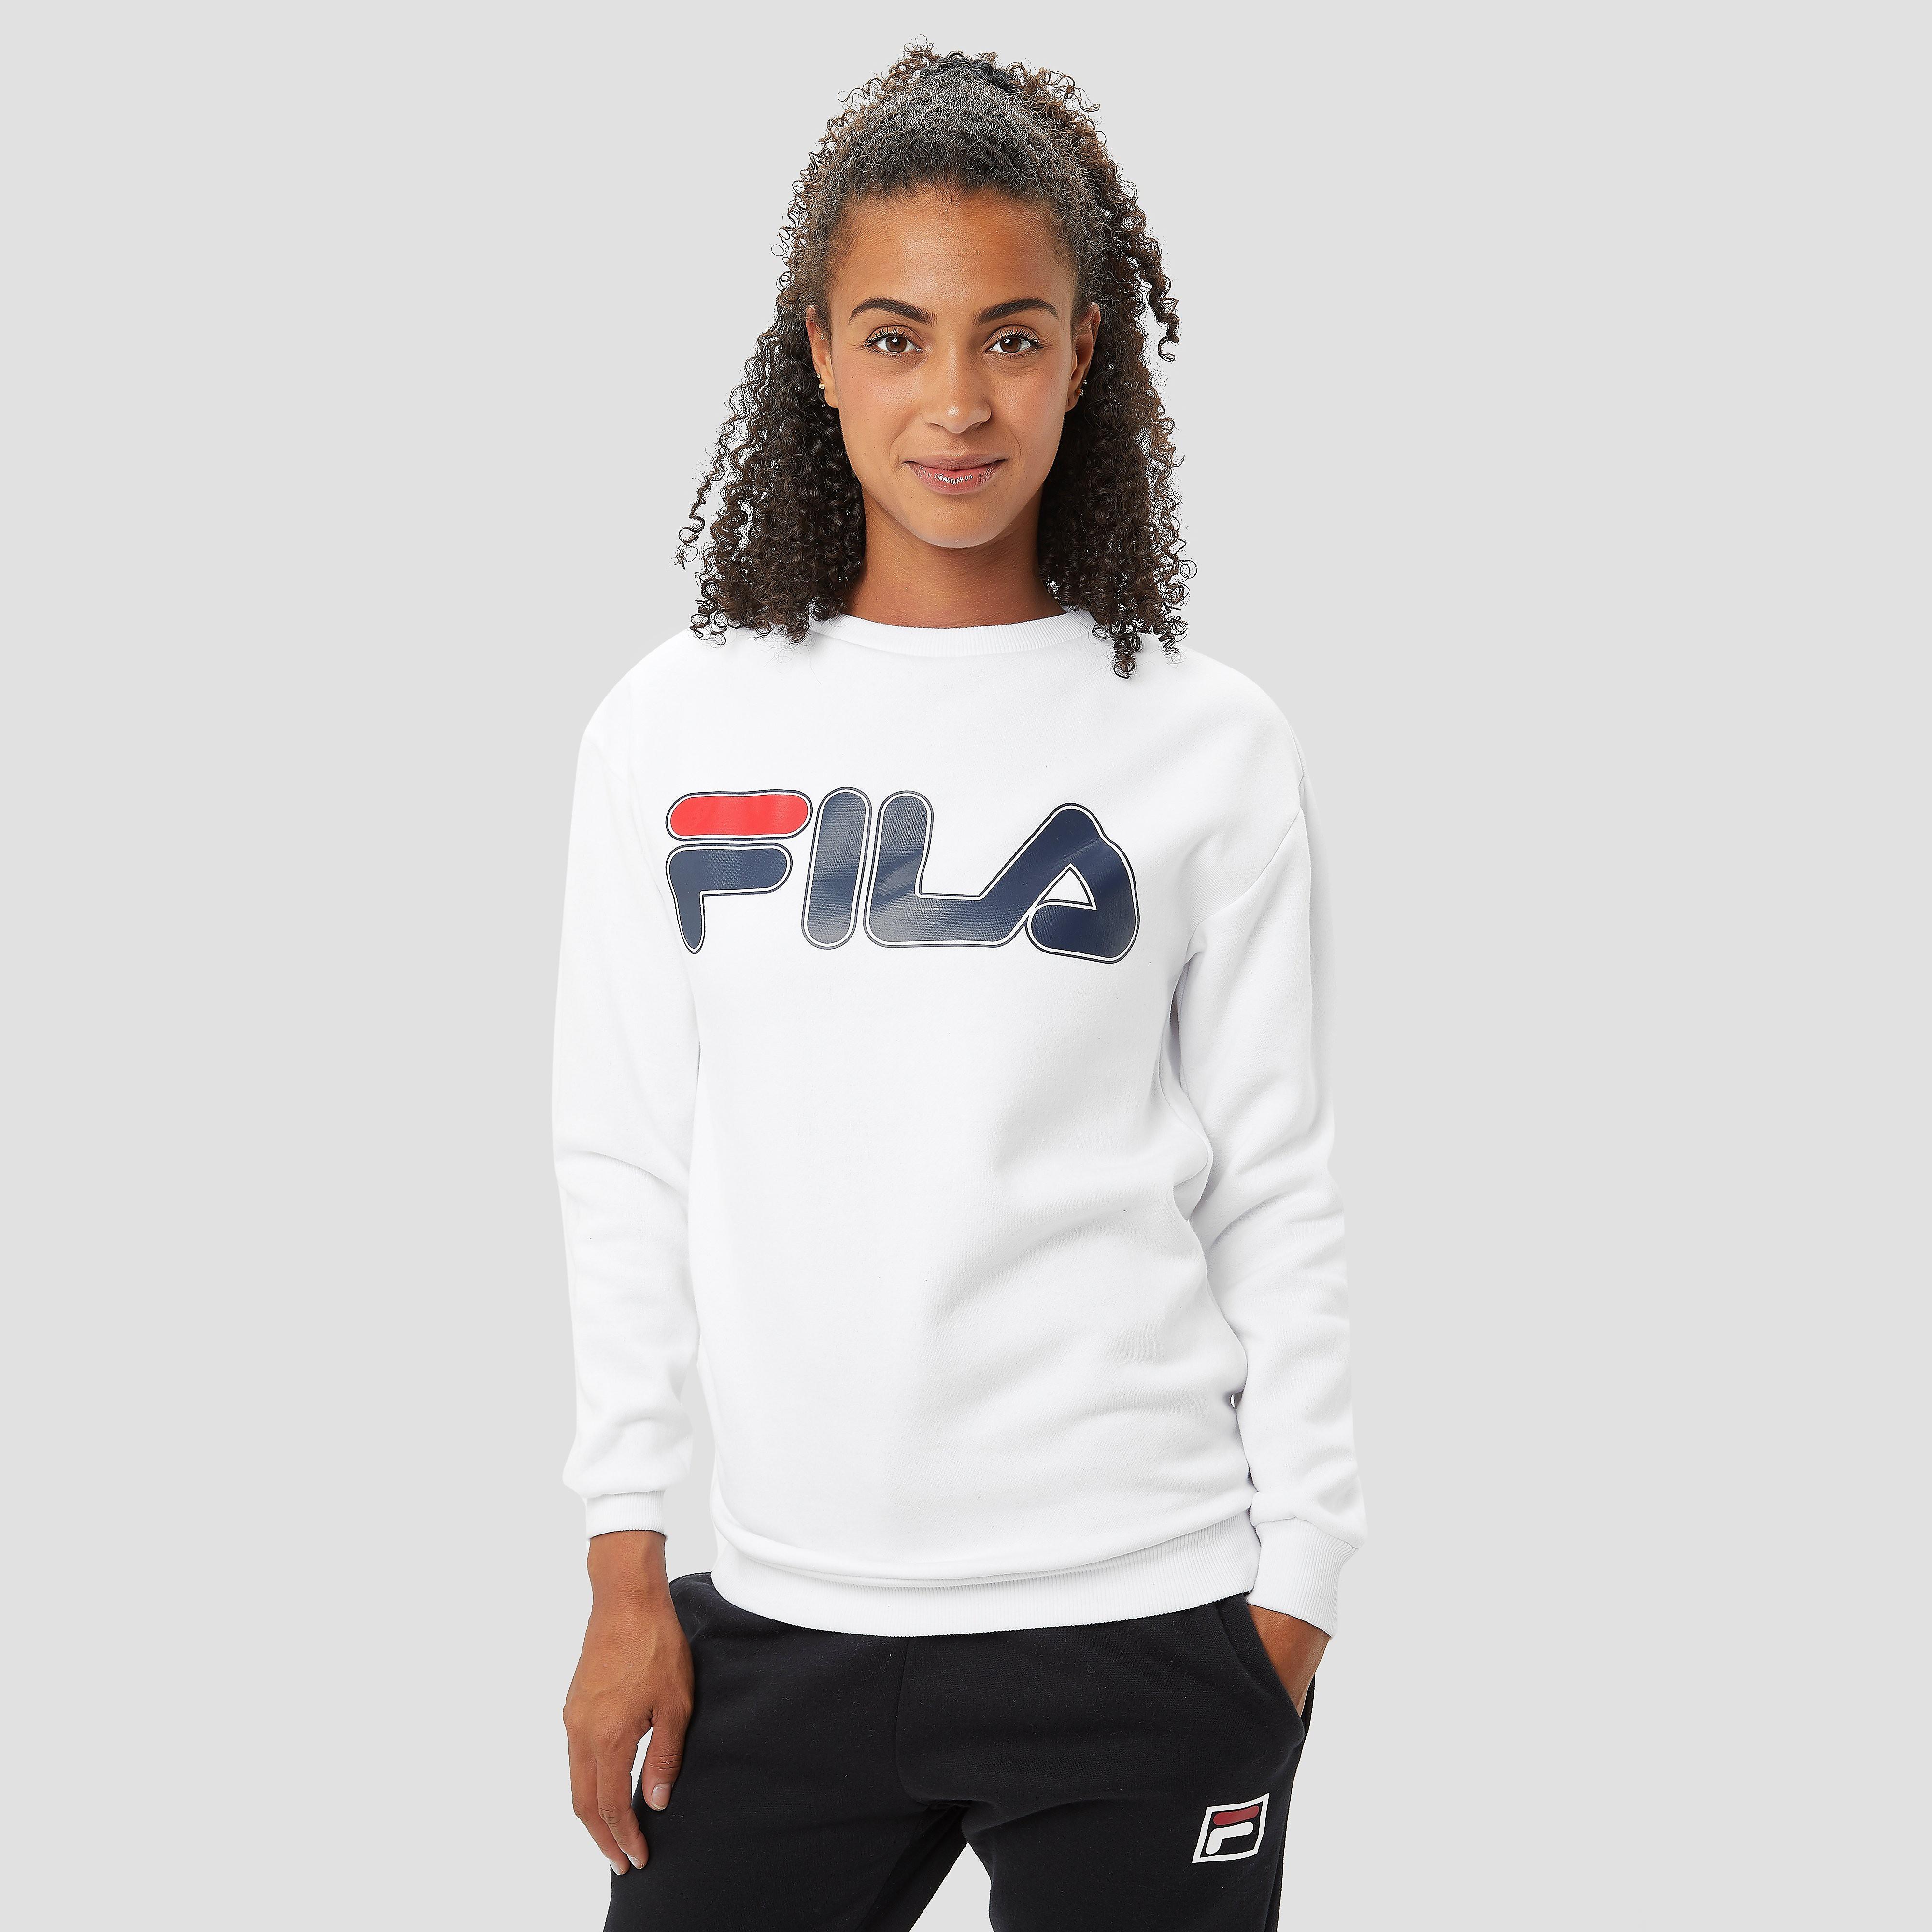 FILA Cydonia 2 crew sweater wit dames Dames